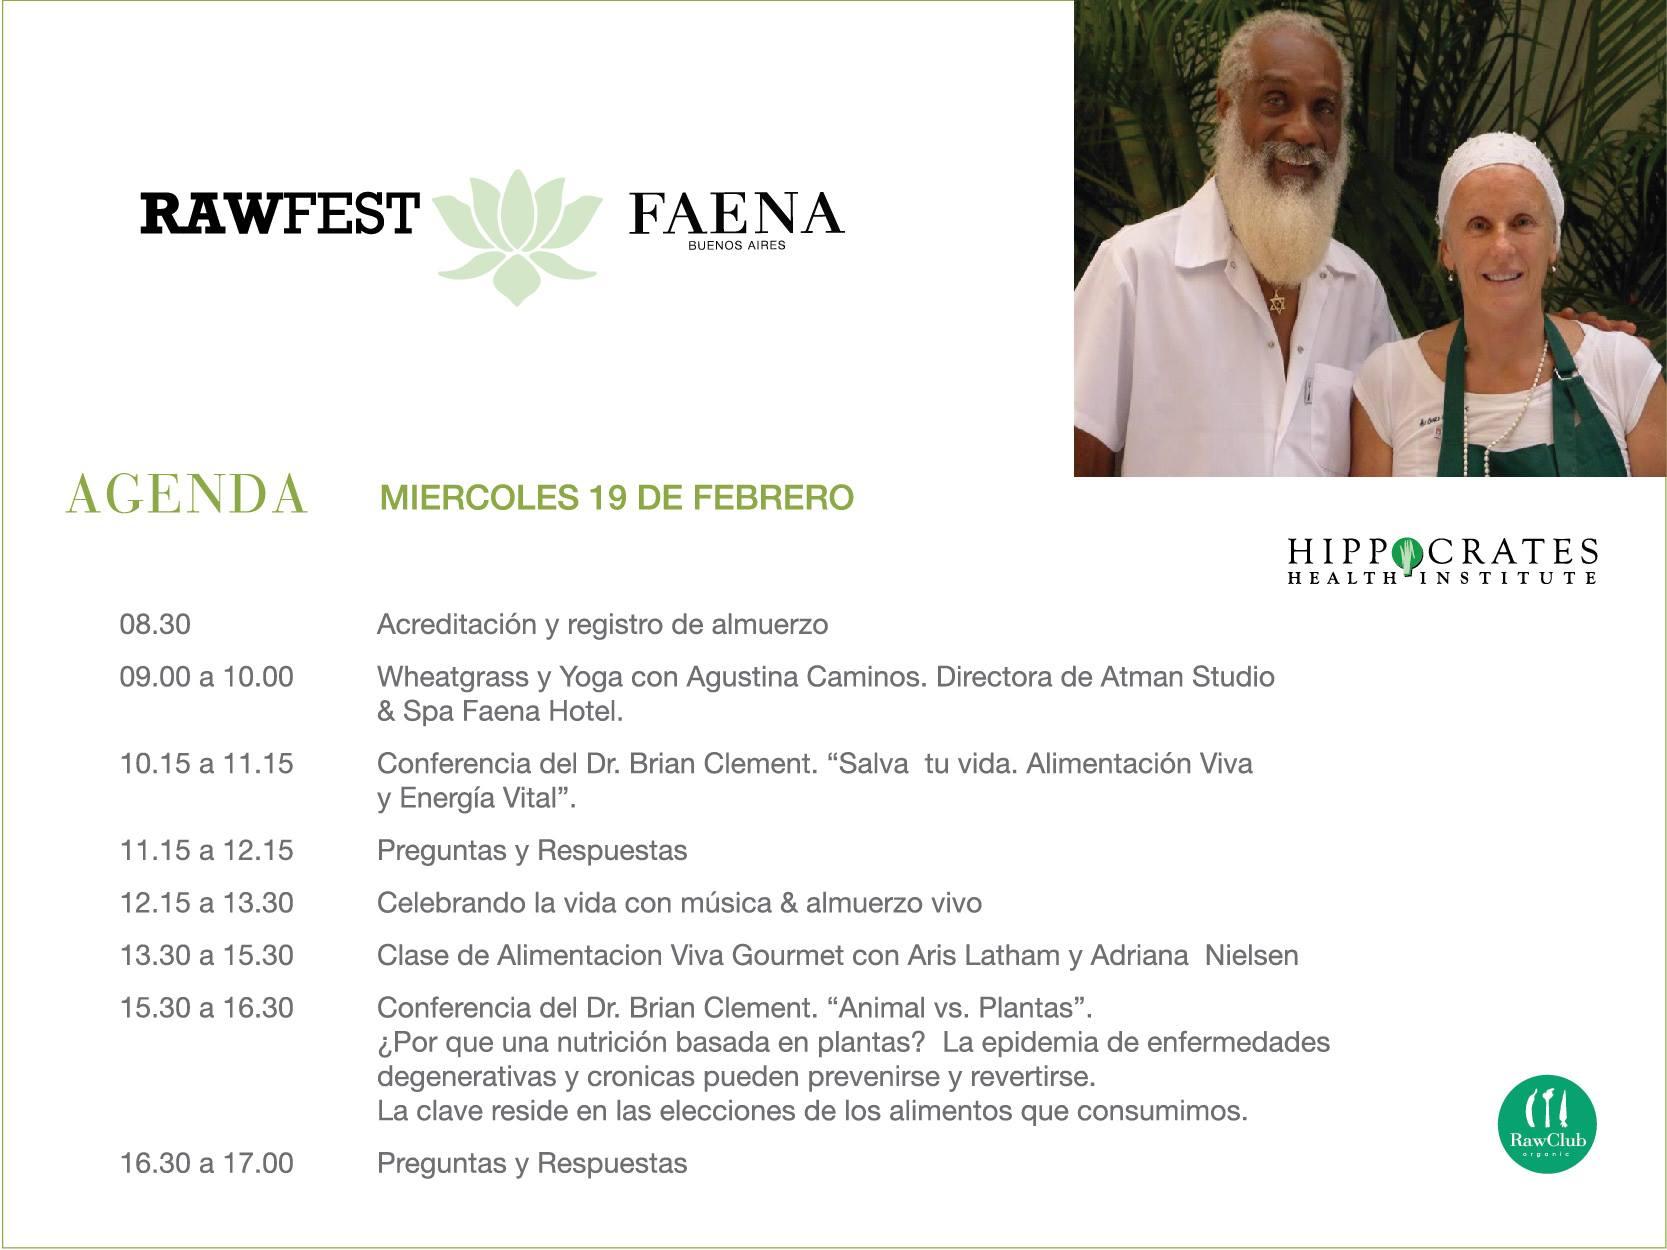 rawfest - miercoles